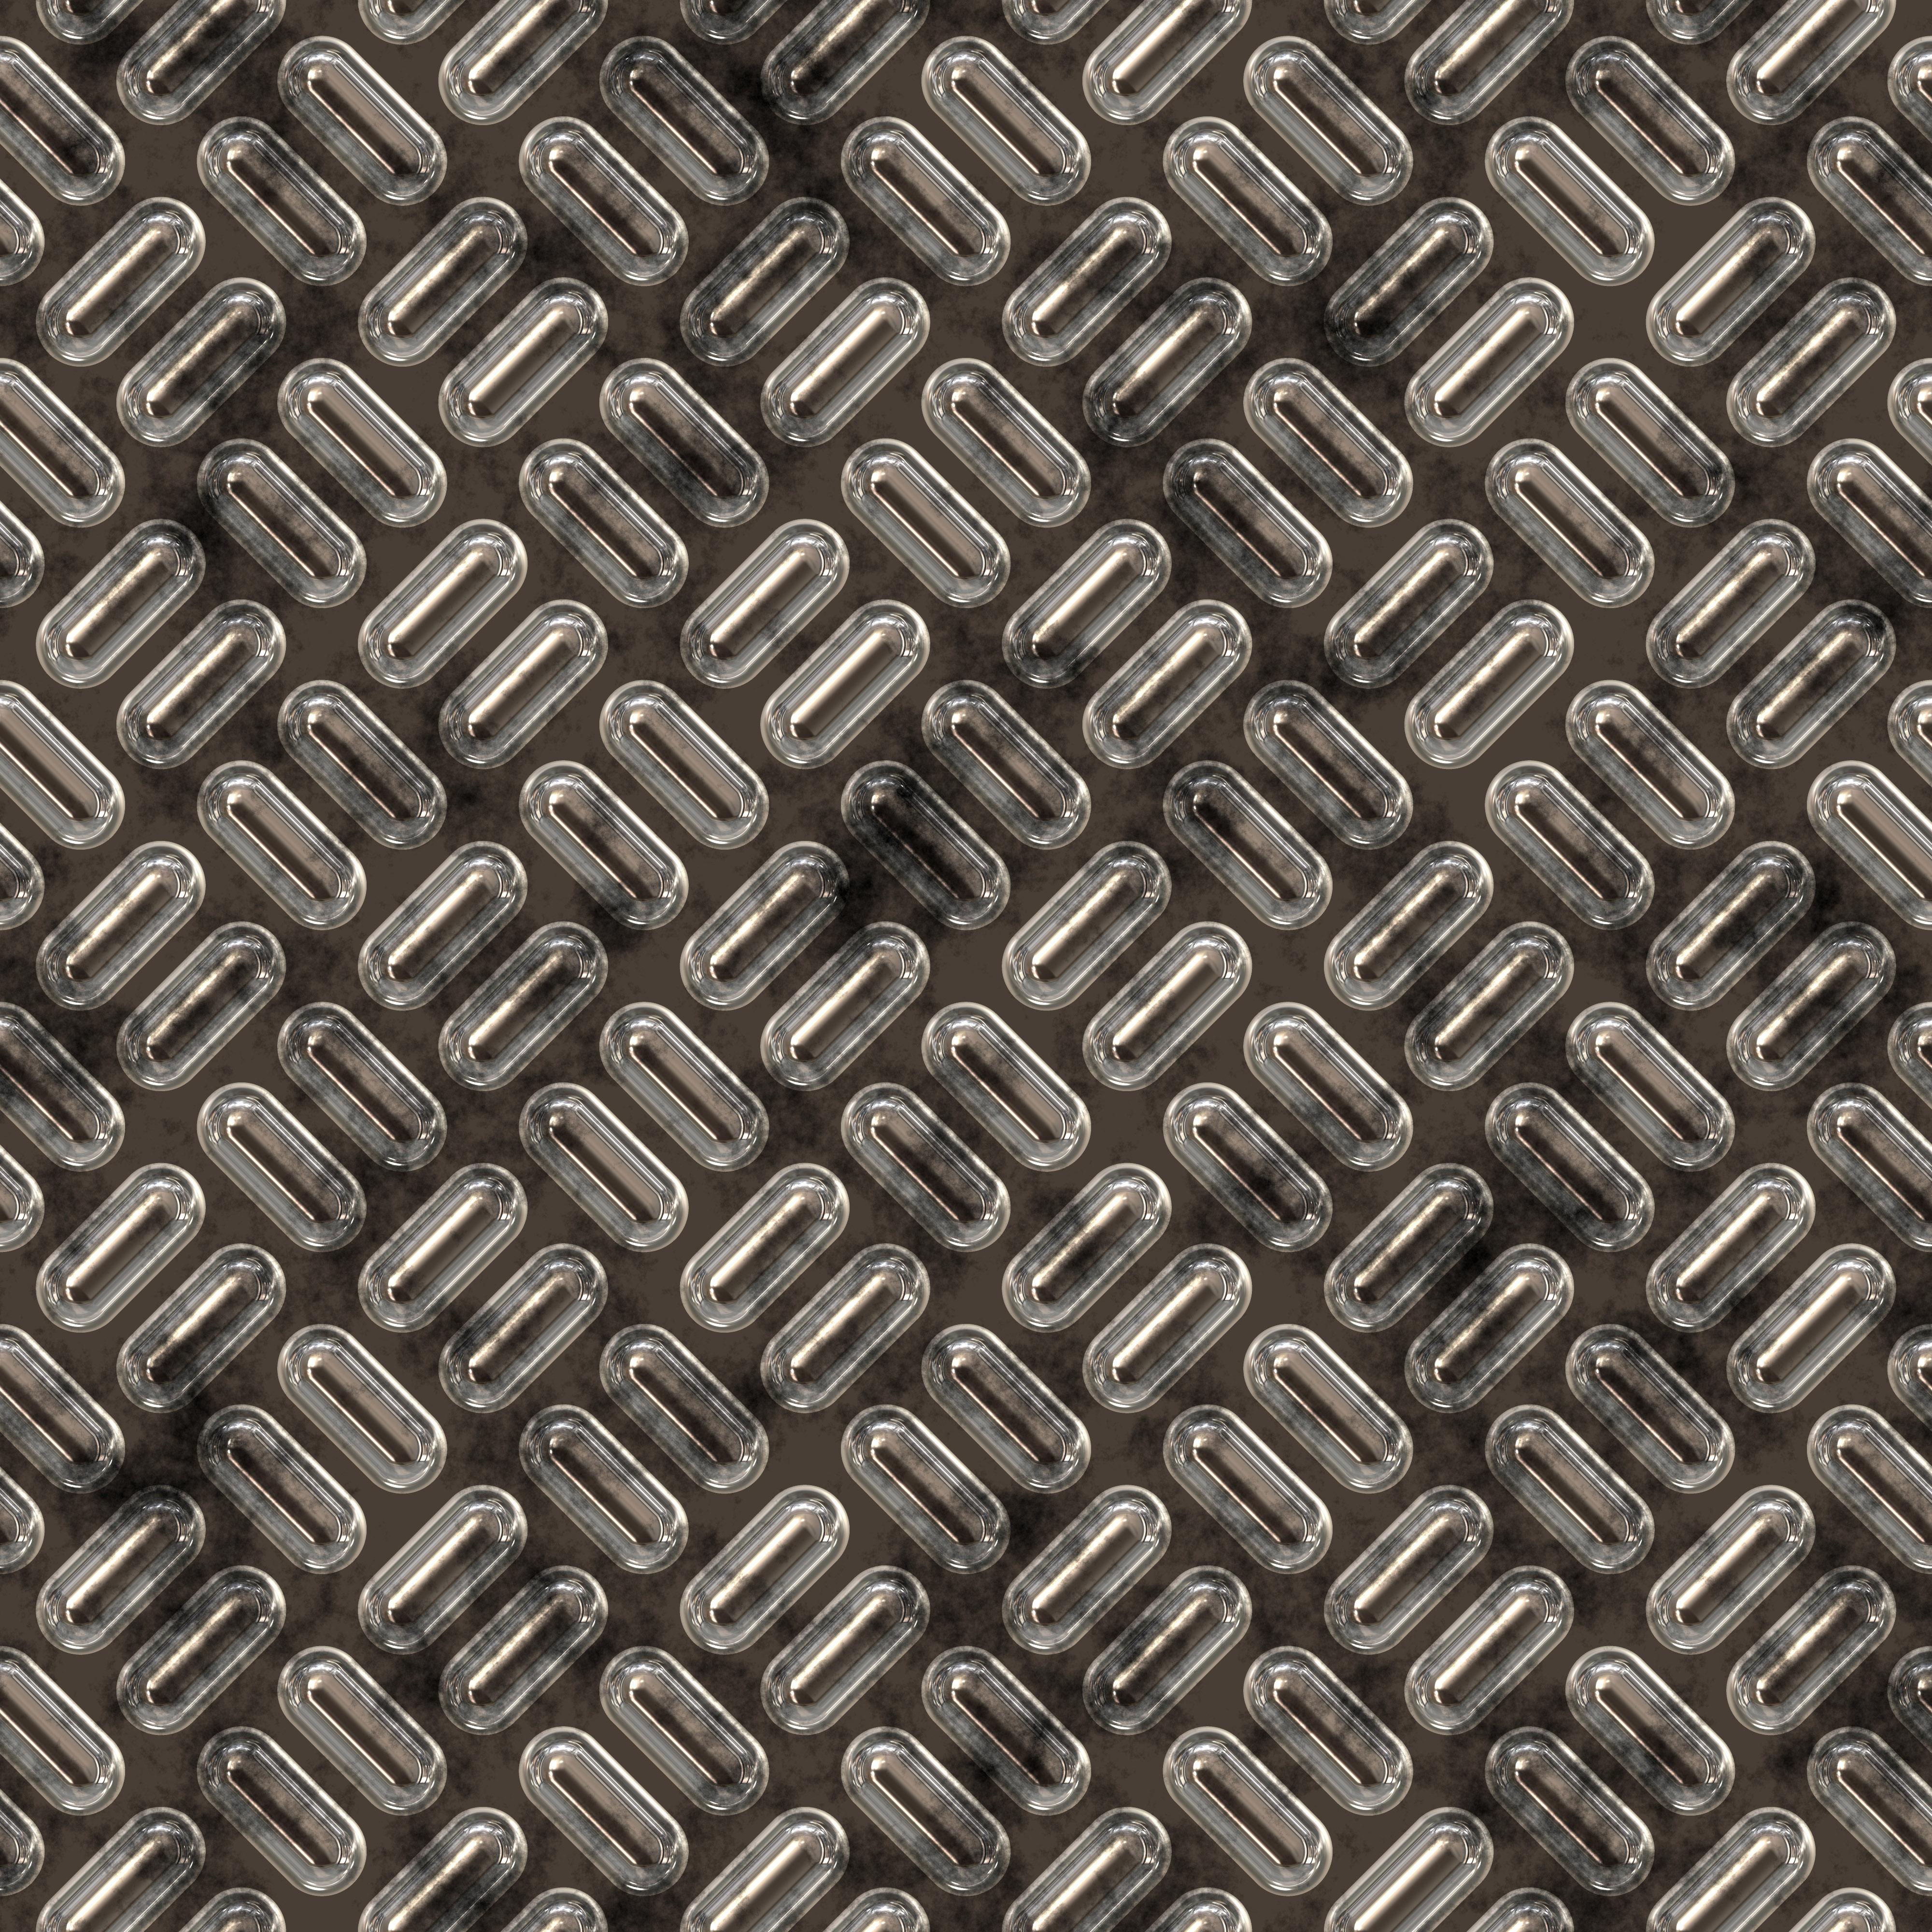 diamond plate metal background texture diamond plate metal background 4000x4000